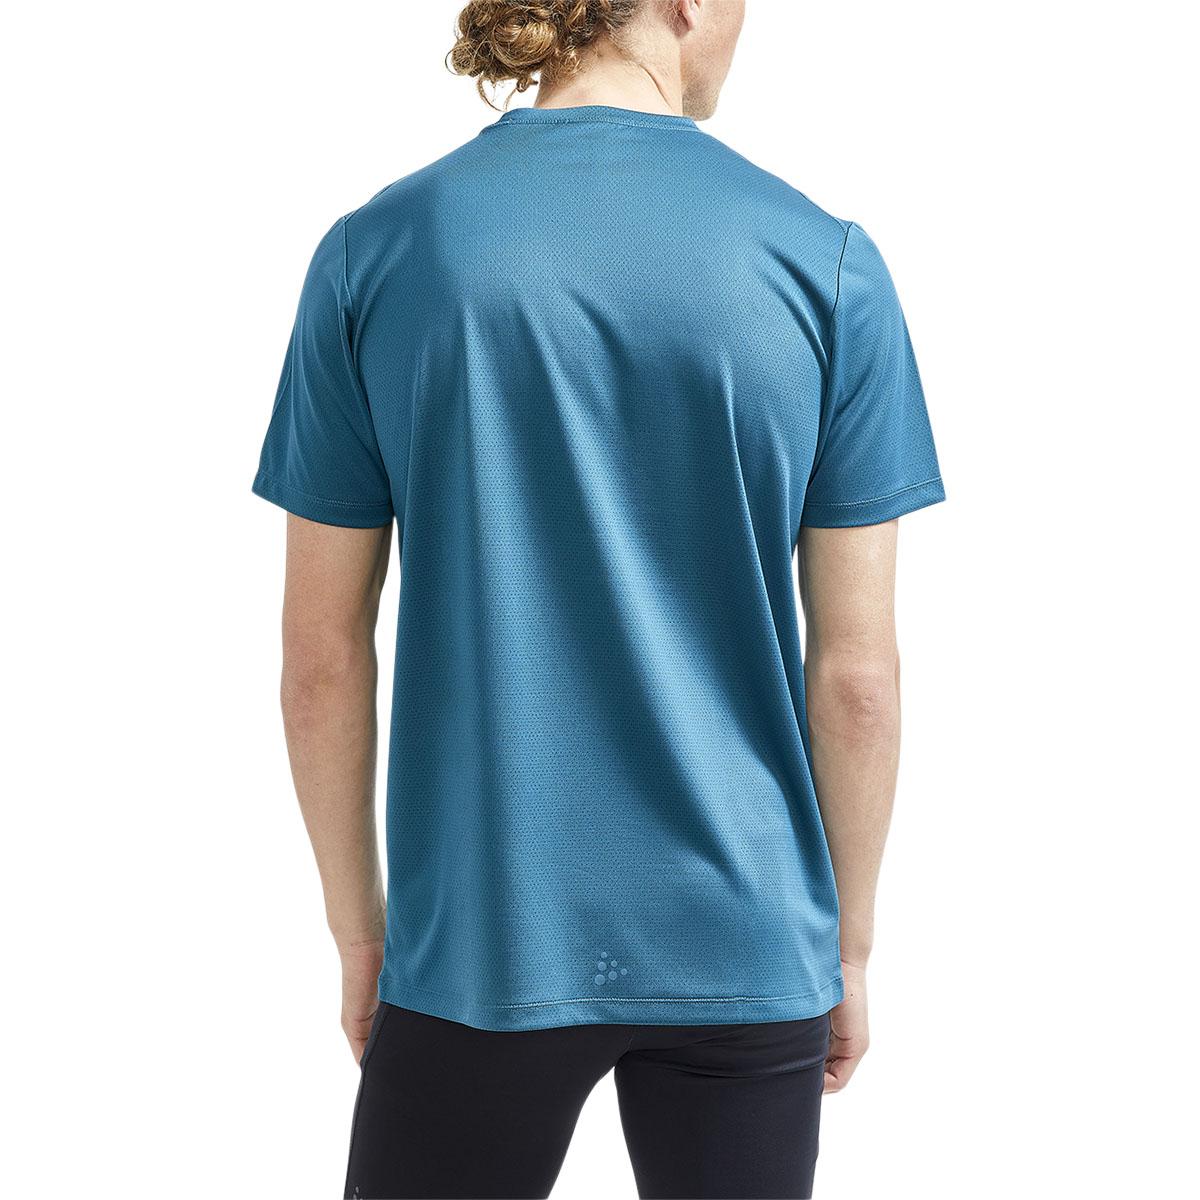 Craft Core Essence Mesh Trænings T-shirt Herre